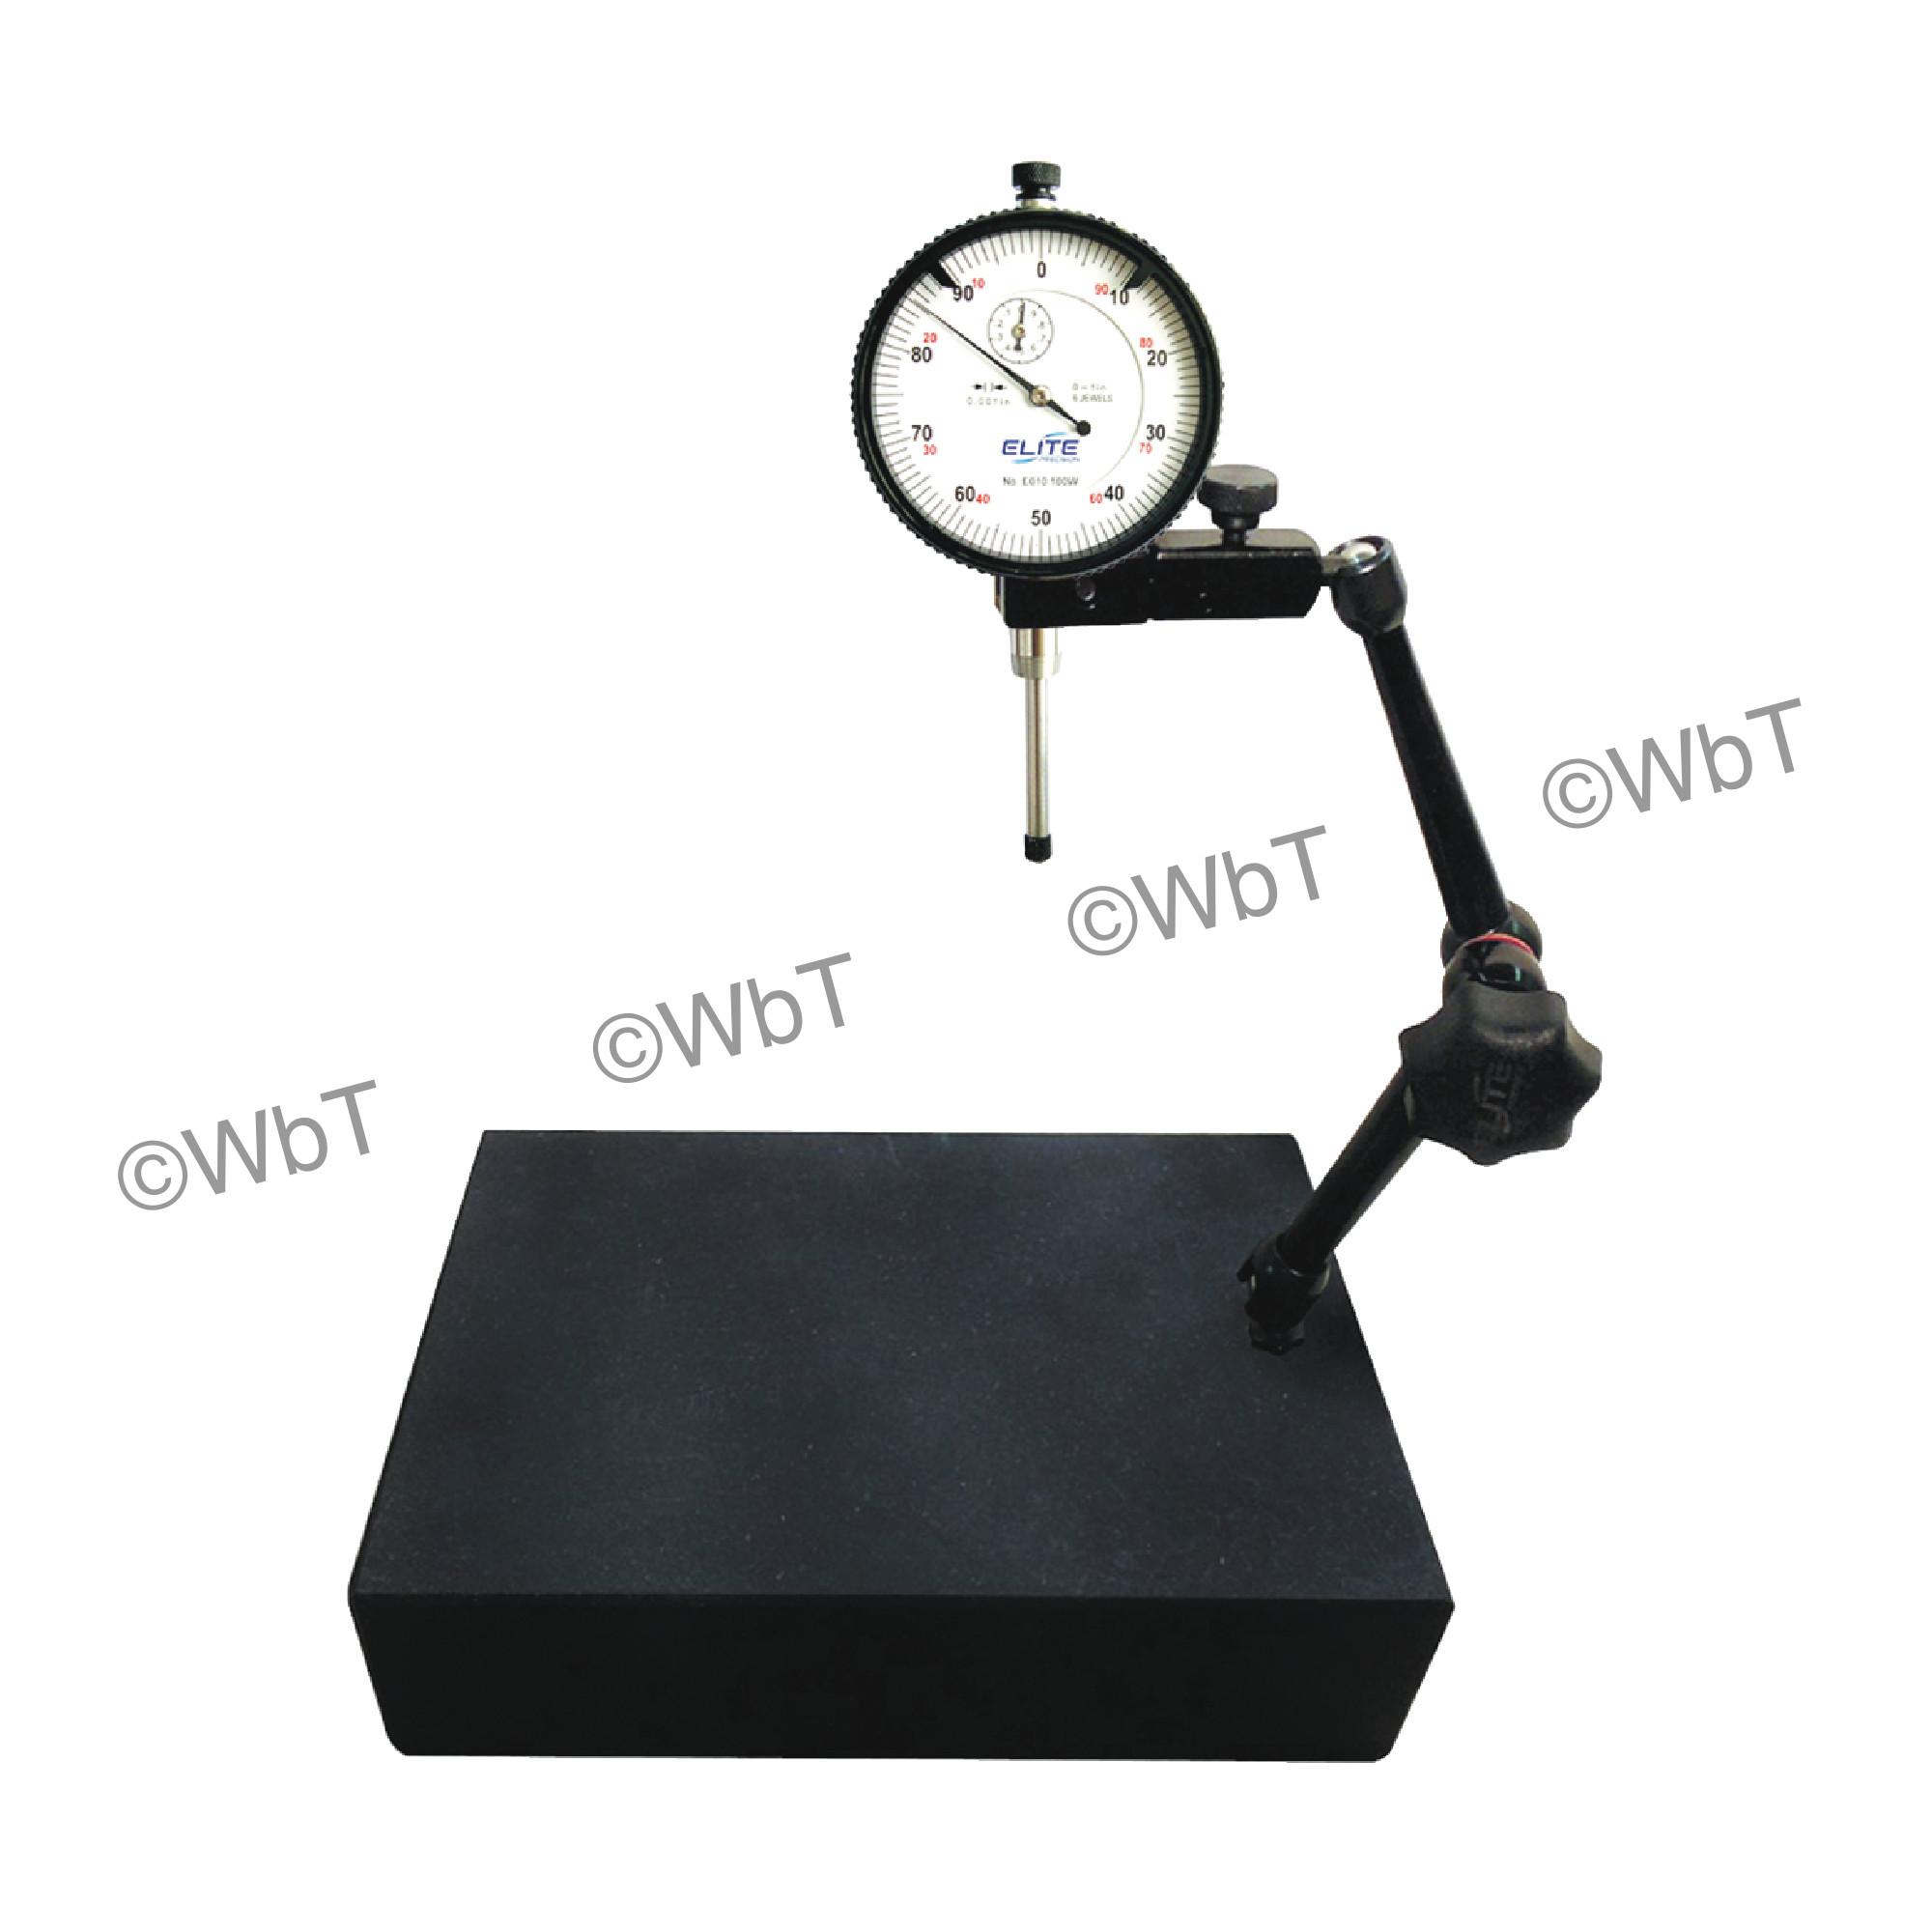 Granite Gage Stand & Dial Indicator